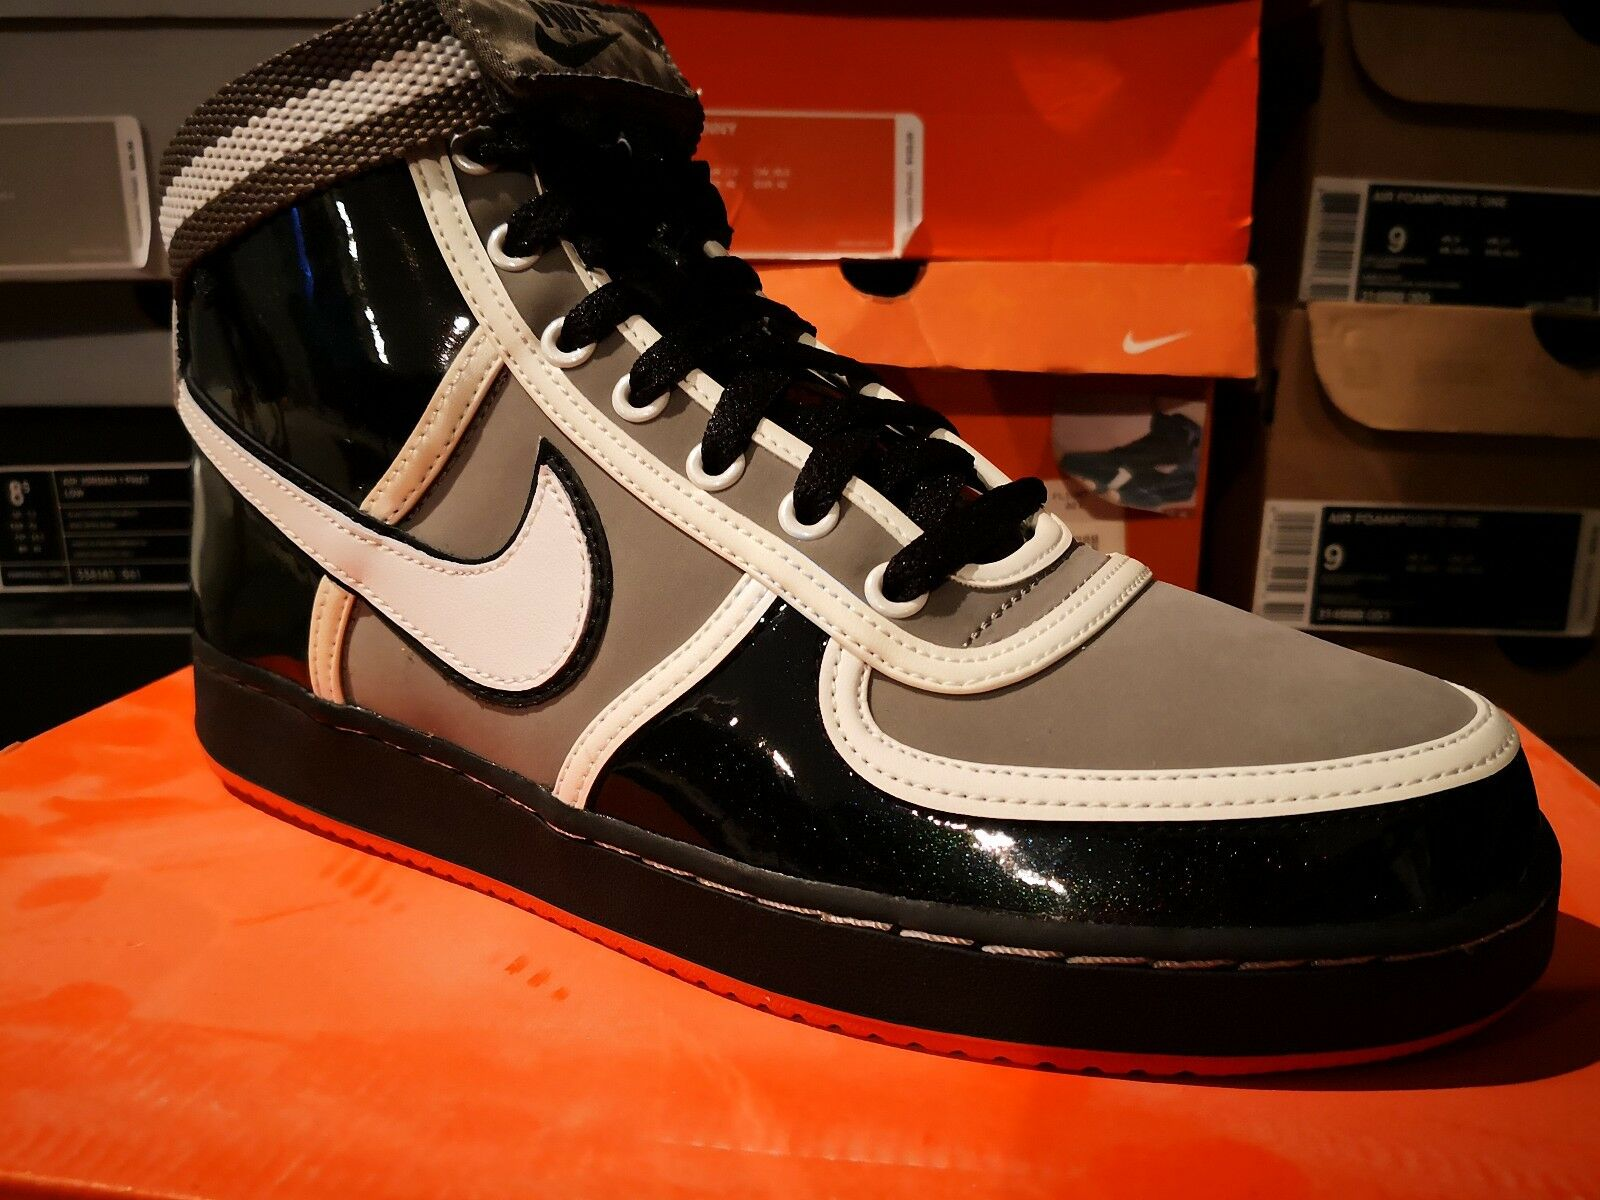 Nike vandal hi - smoking oberste presto aus weißen nrg air max sb